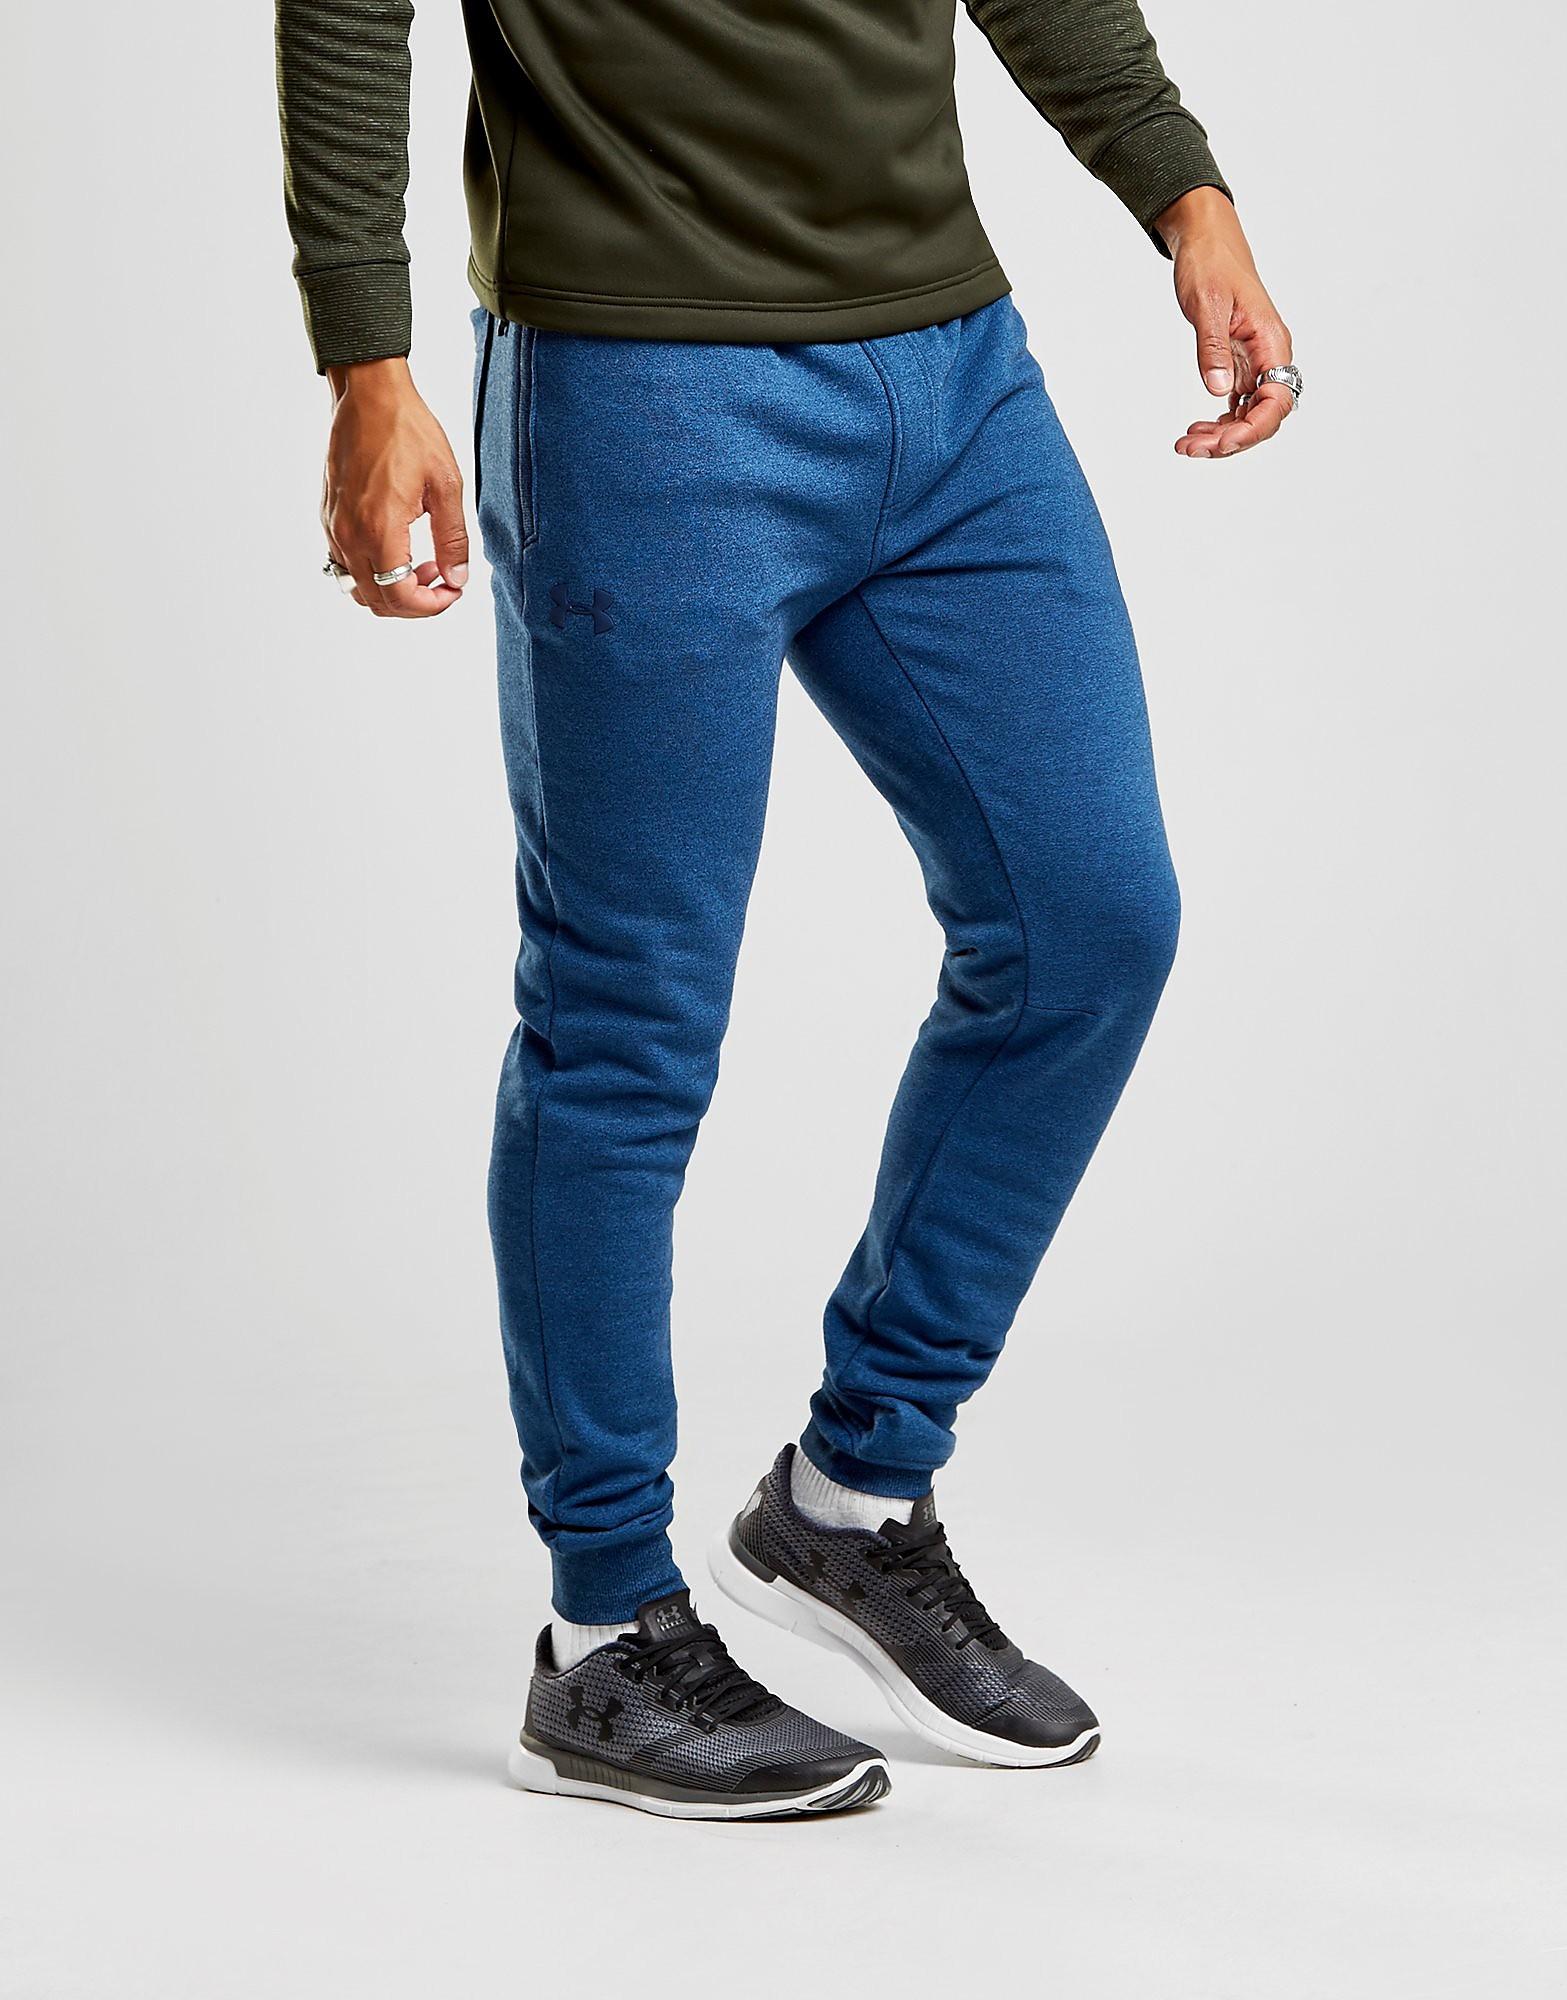 416911f3bb52e UNDER ARMOUR Sportunterteile - Under Armour Threadborne Fleece Pants - Blau  - Mens, Blau